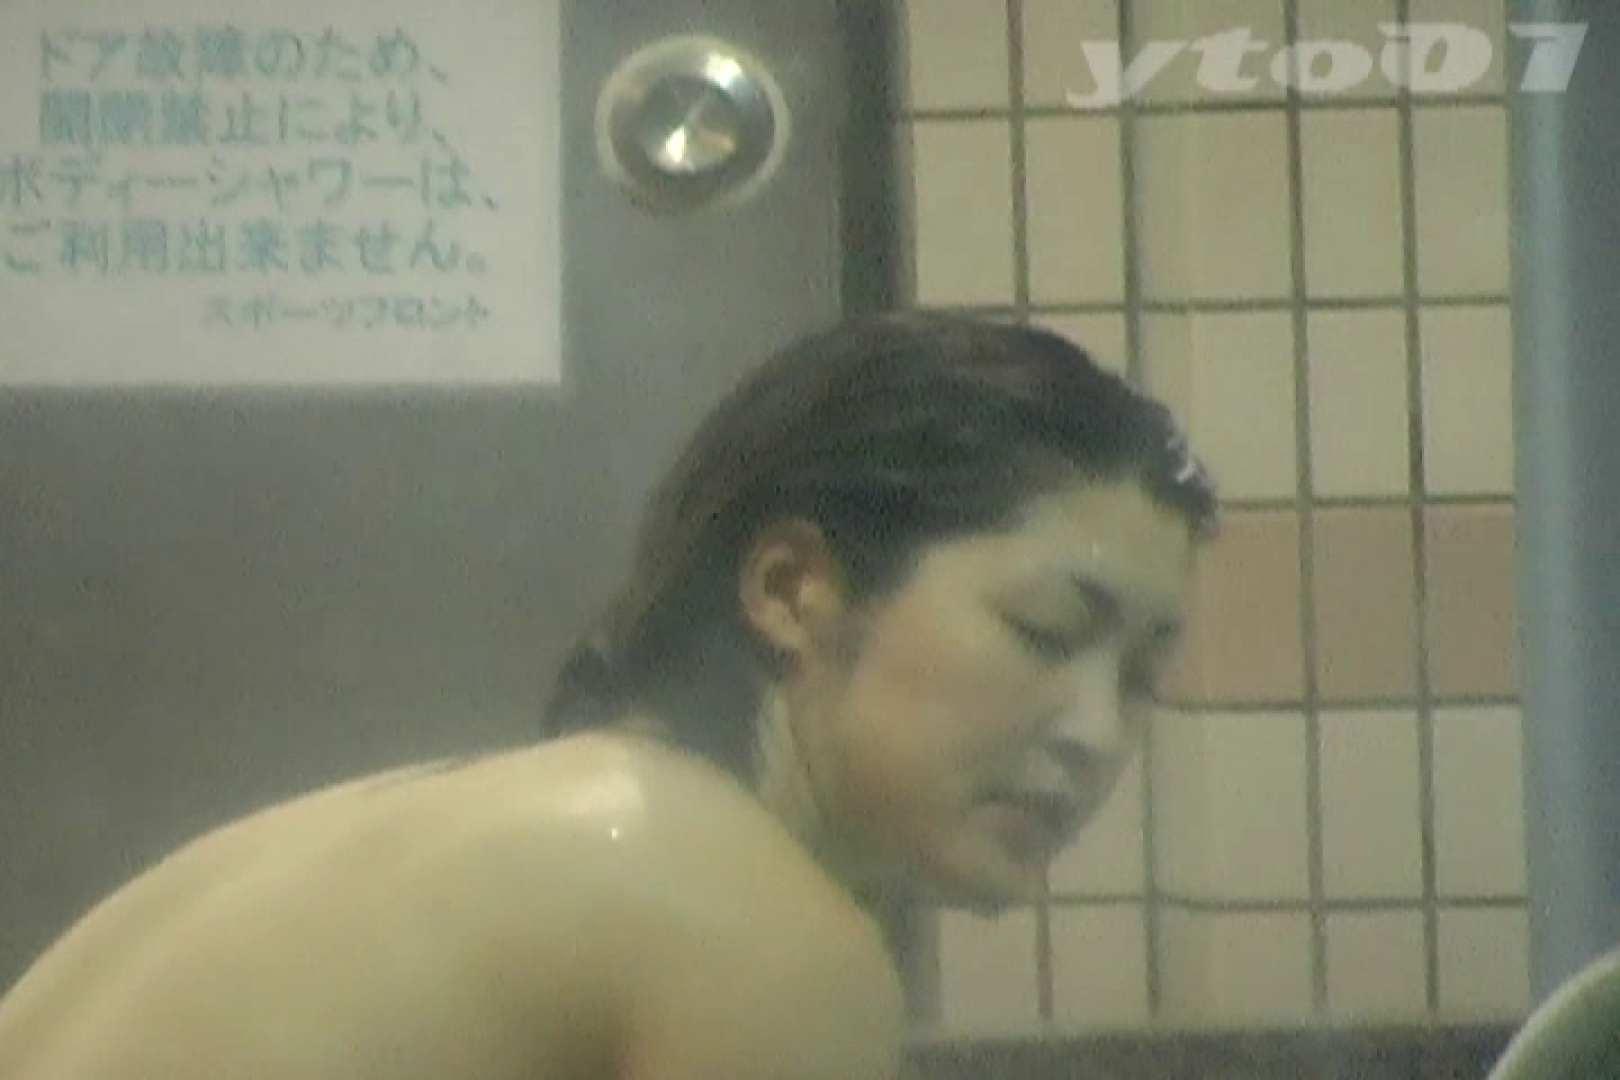 ▲復活限定▲合宿ホテル女風呂盗撮 Vol.06 入浴  85pic 84